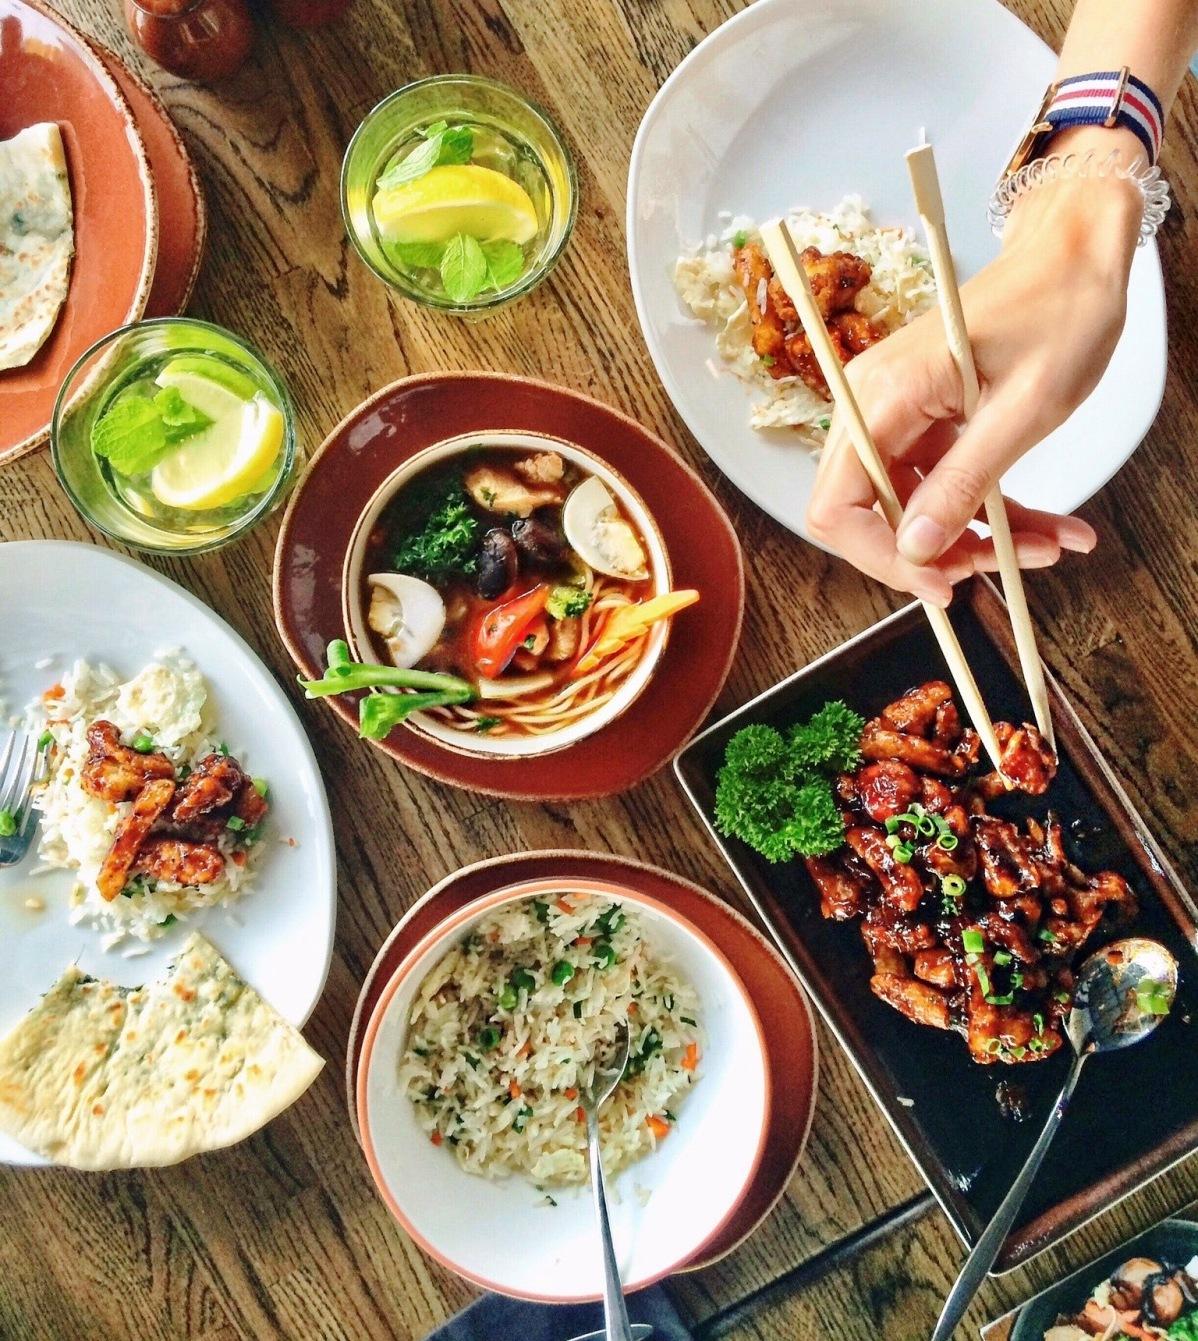 Best Chinese Food Restaurants in Montreal: Best of MTL 2020